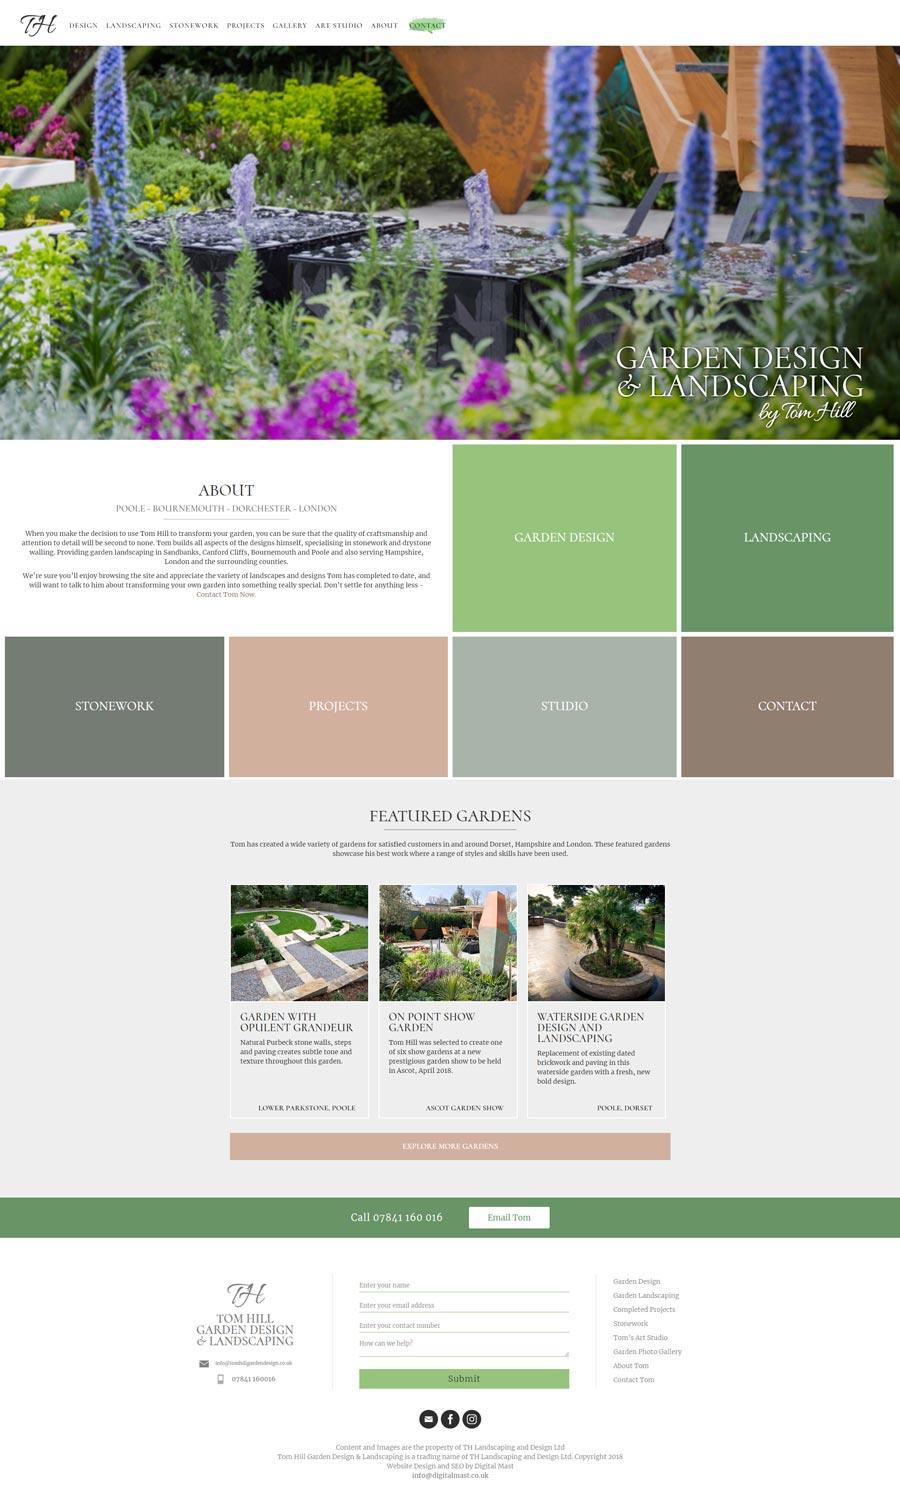 Garden Design and Landscaping Website Design